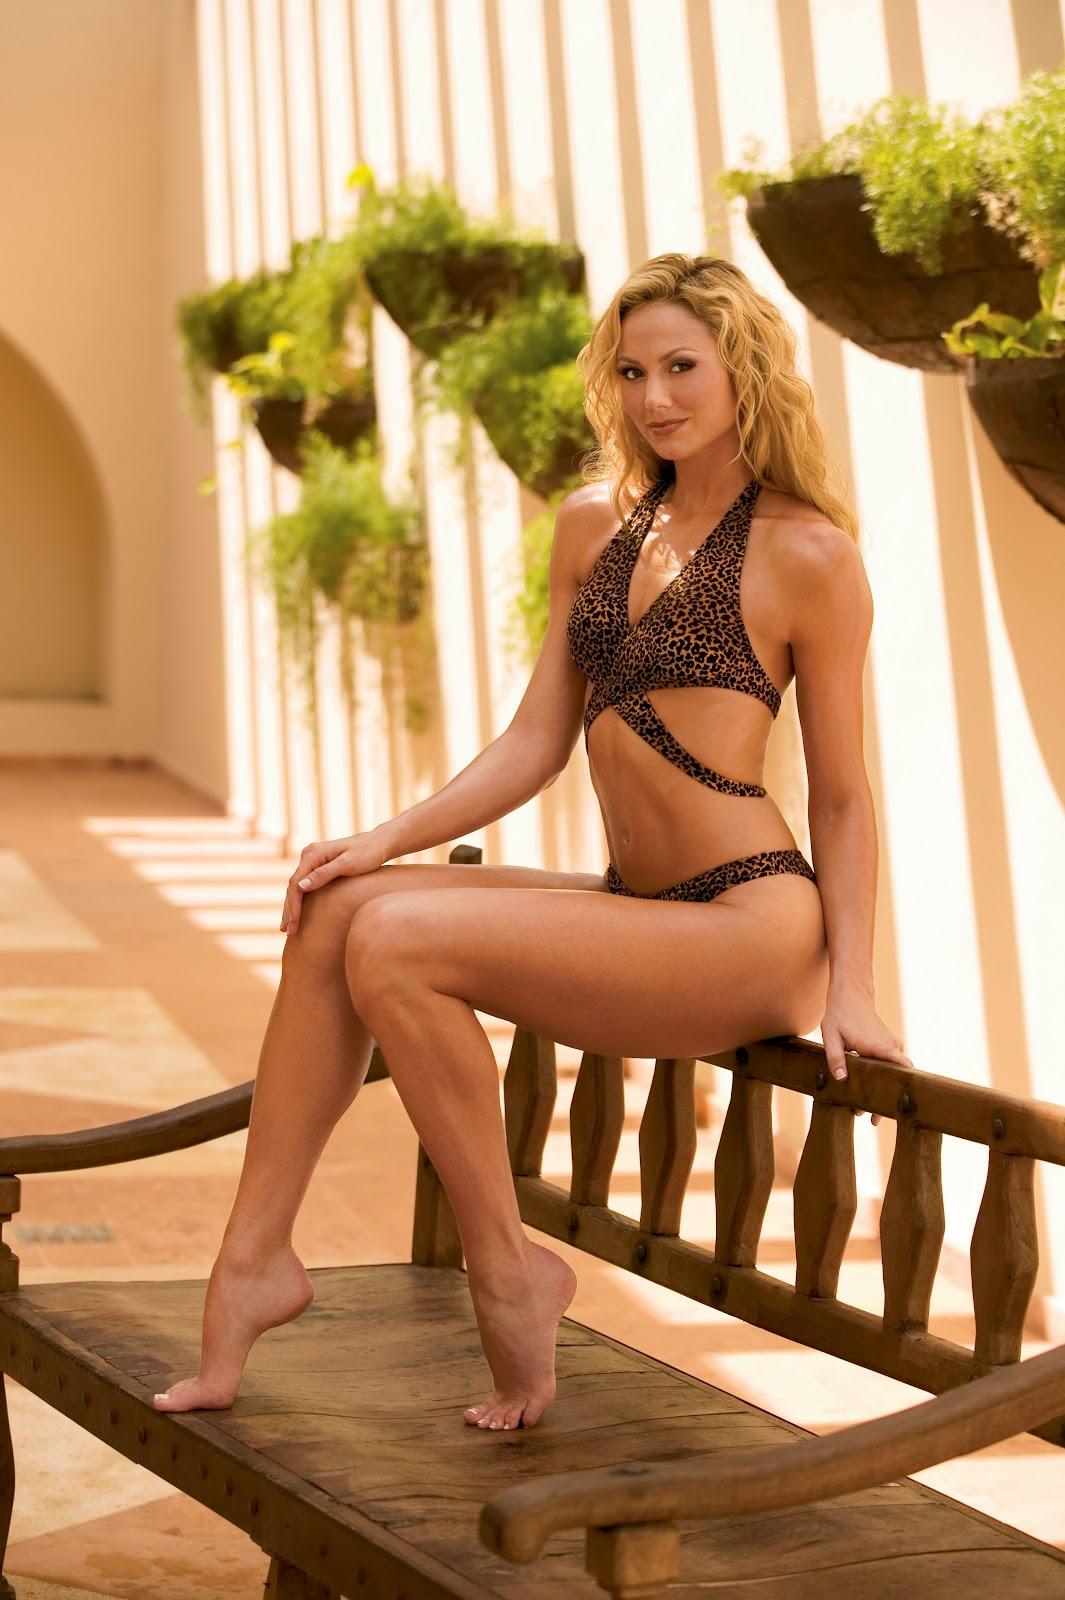 Alexis adams in her second vegas date 6